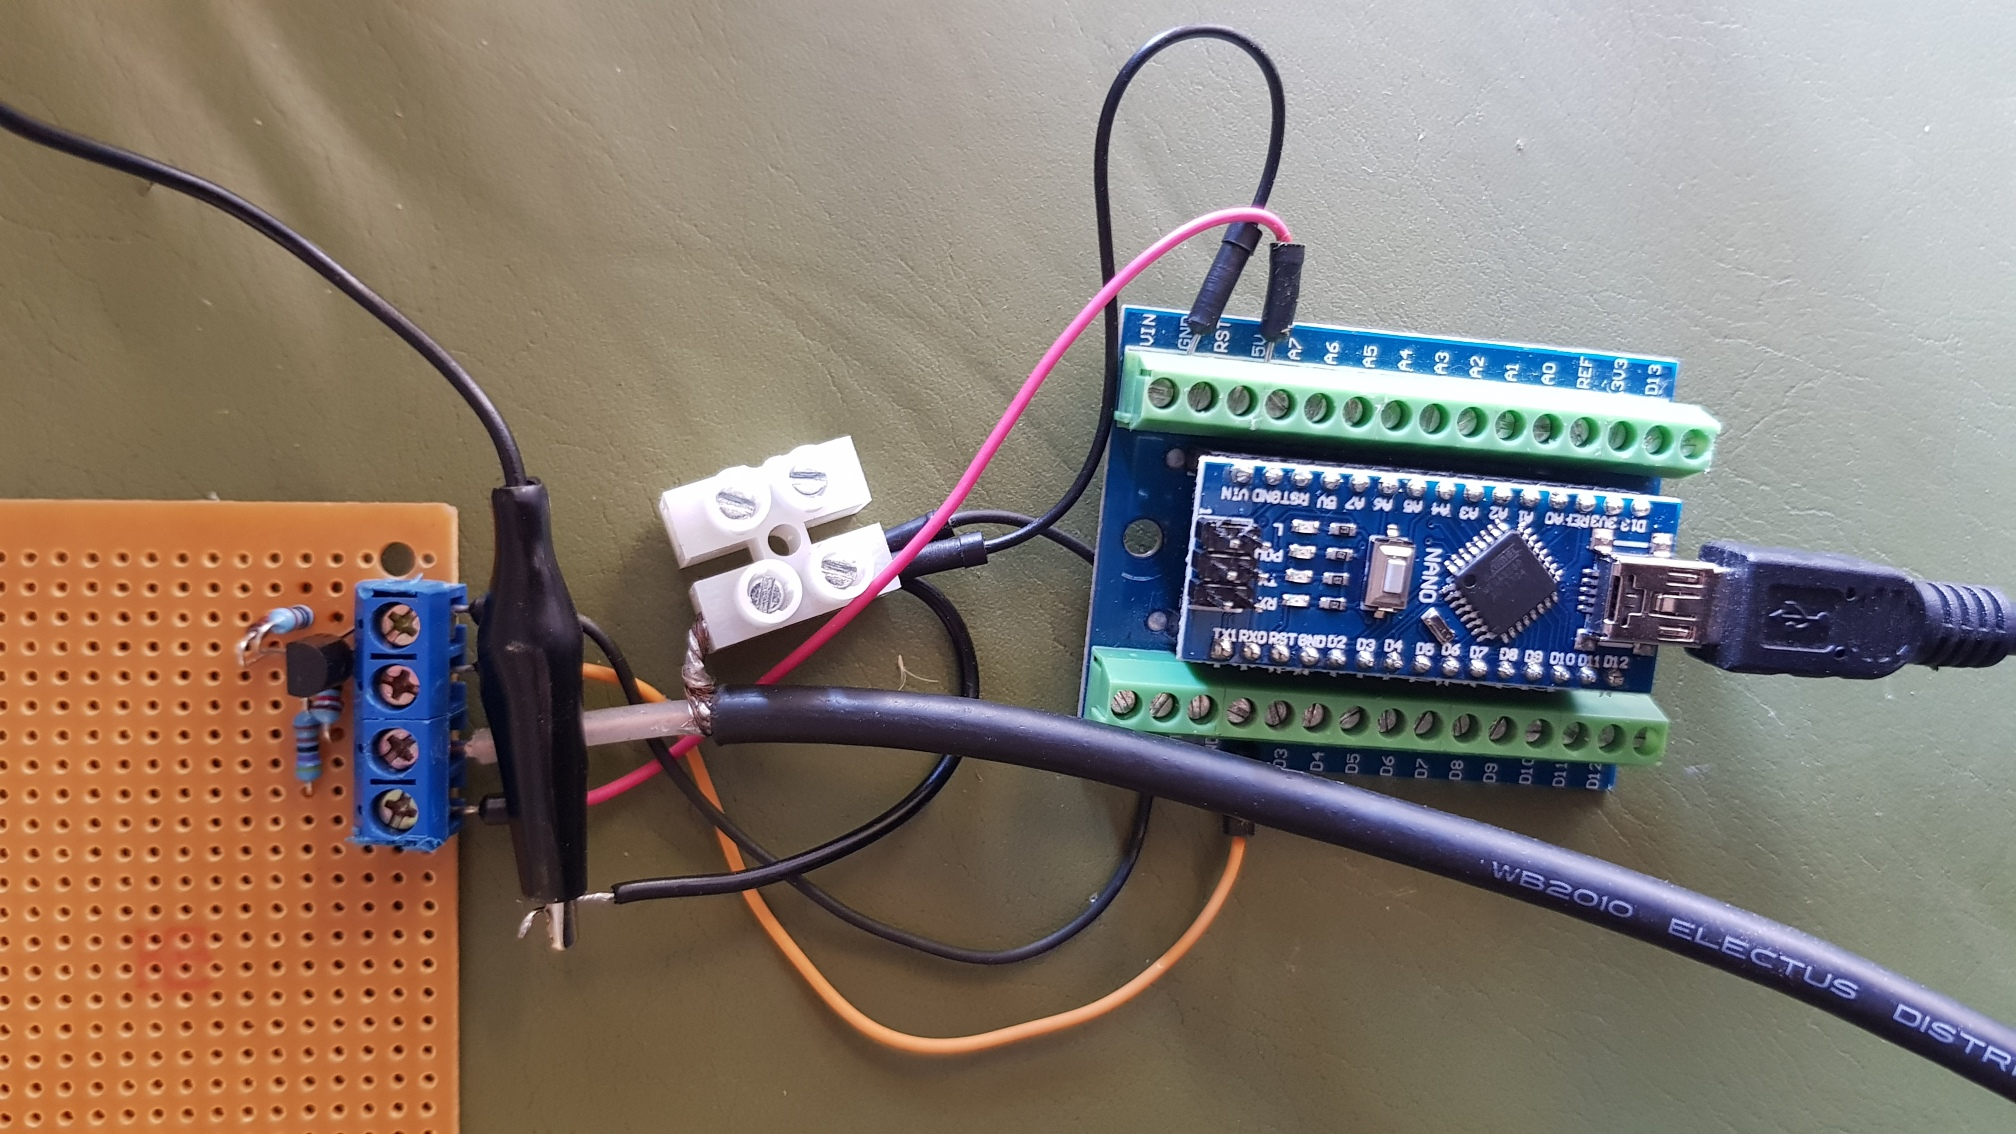 Allegrobotics - Measuring RPM via spark plug lead